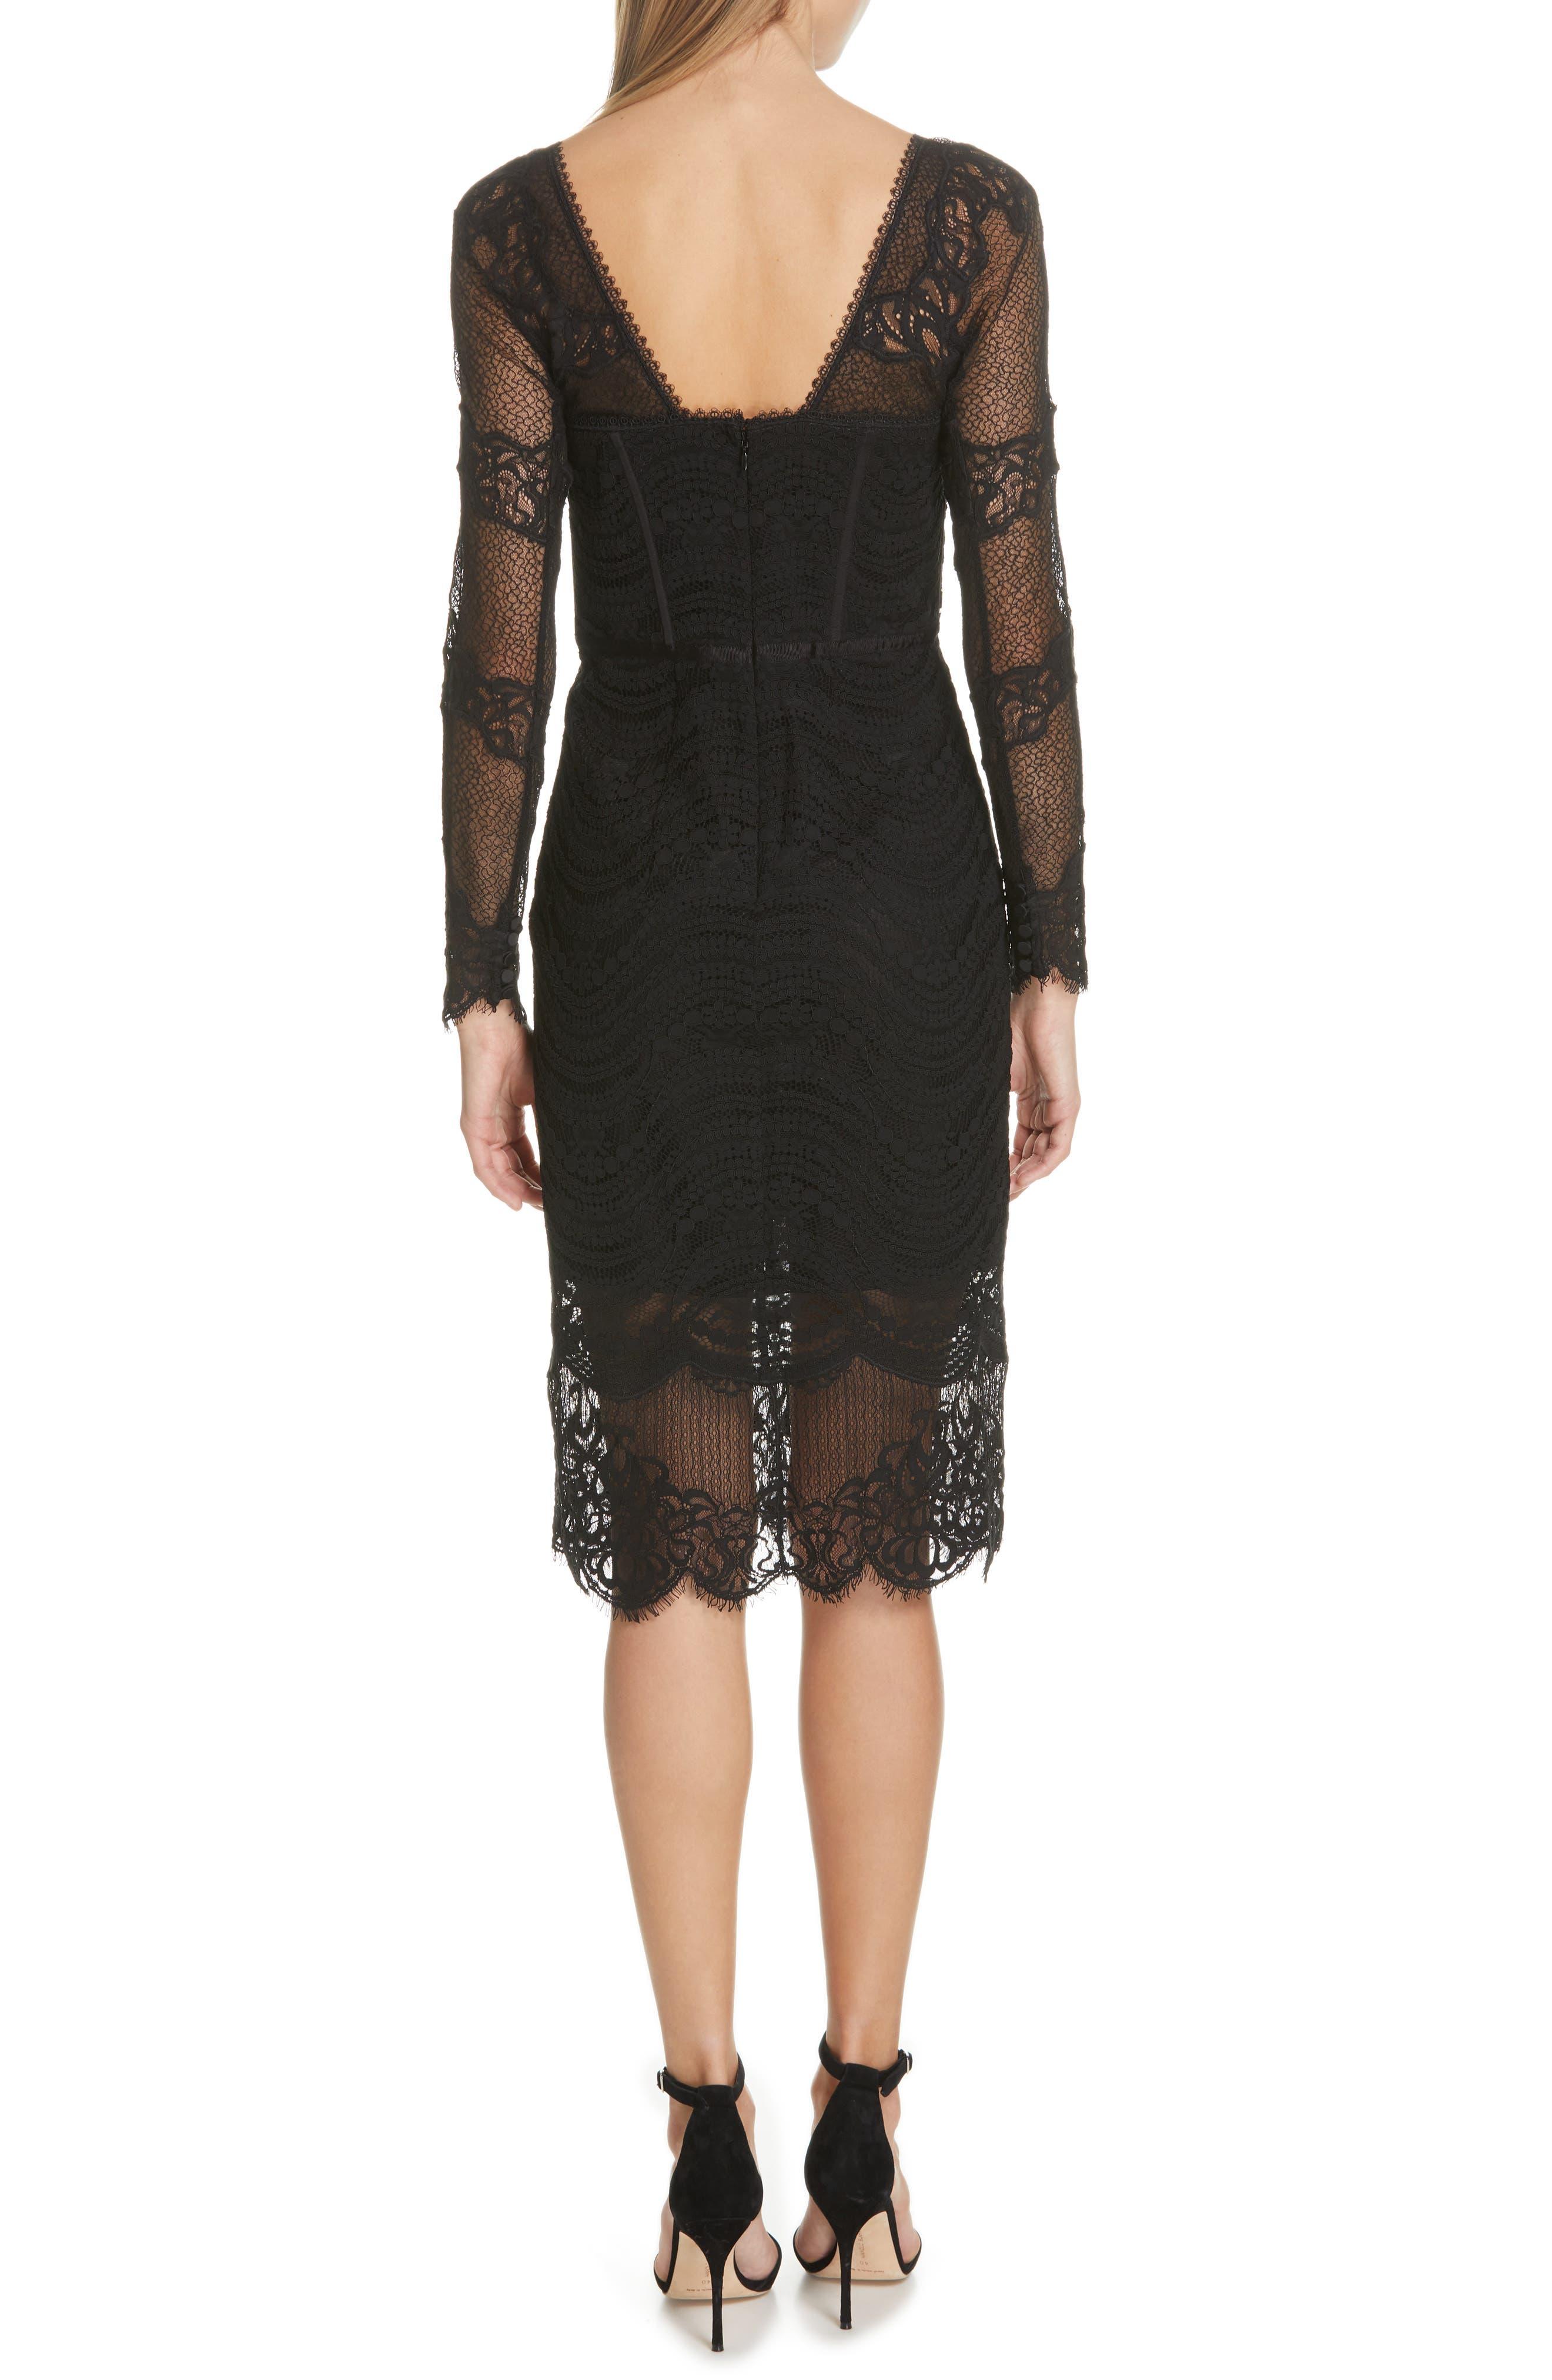 JONATHAN SIMKHAI,                             Lace Bustier Bodysuit Dress,                             Alternate thumbnail 2, color,                             BLACK